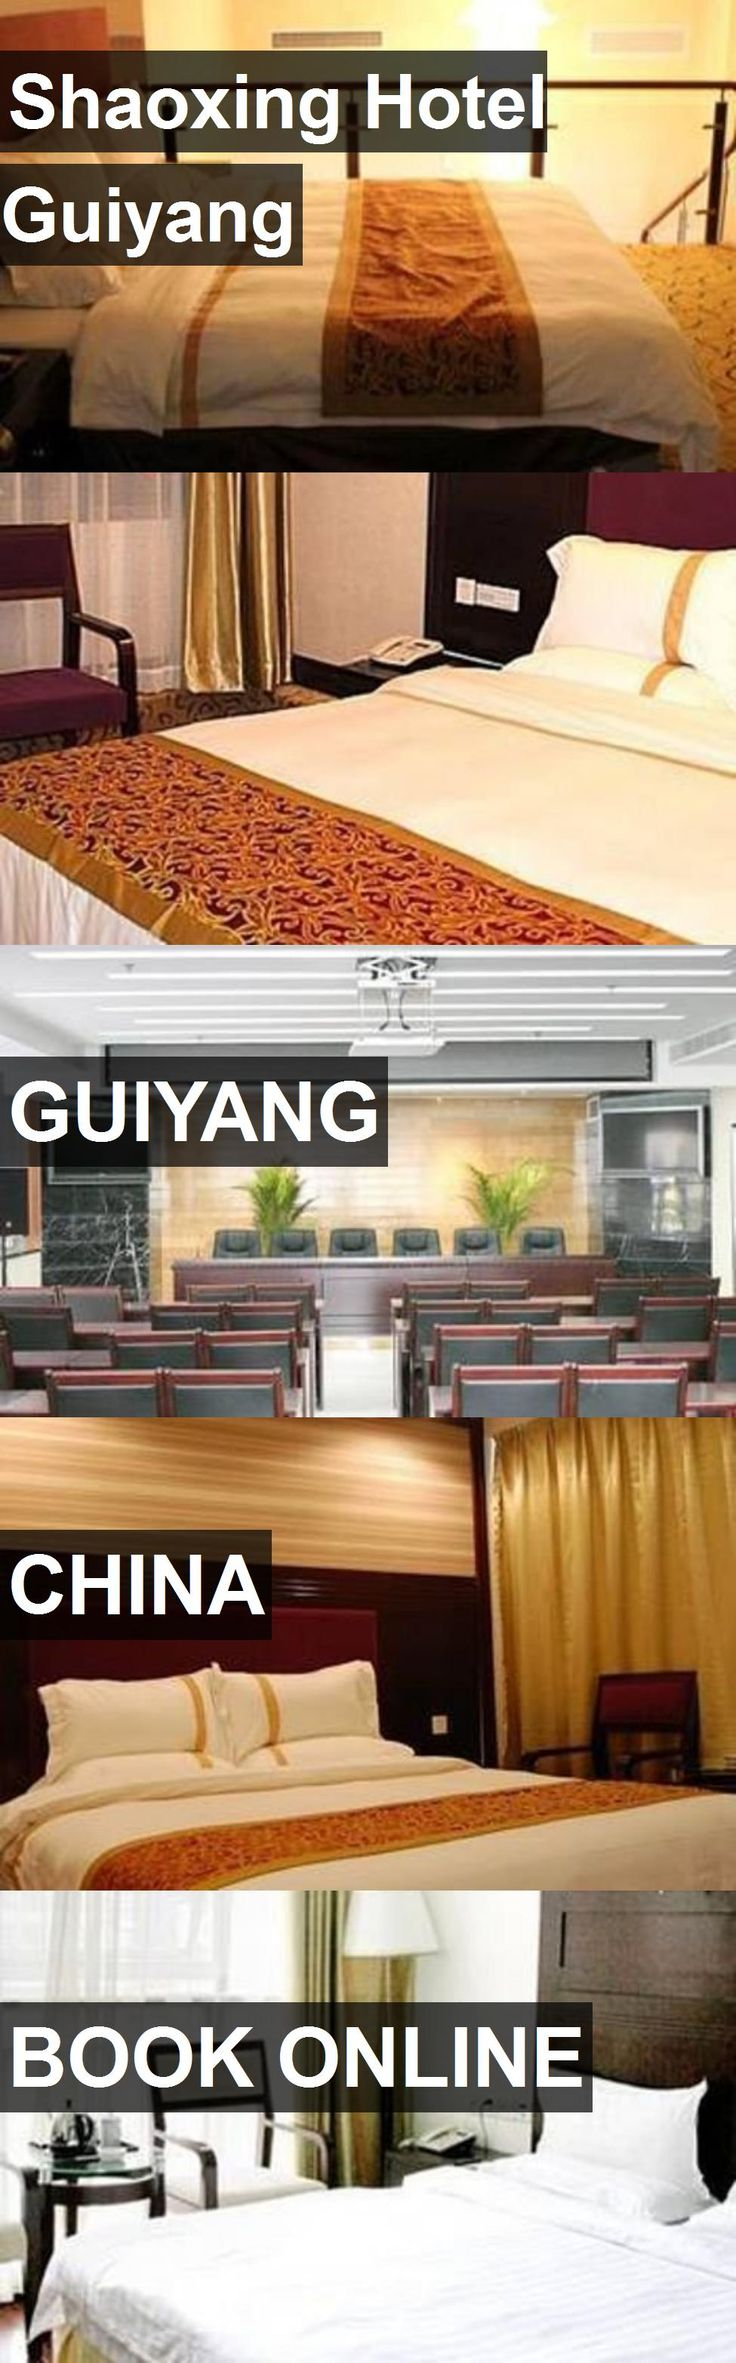 Shaoxing Hotel Guiyang in Guiyang, China. For more information, photos, reviews and best prices please follow the link. #China #Guiyang #travel #vacation #hotel